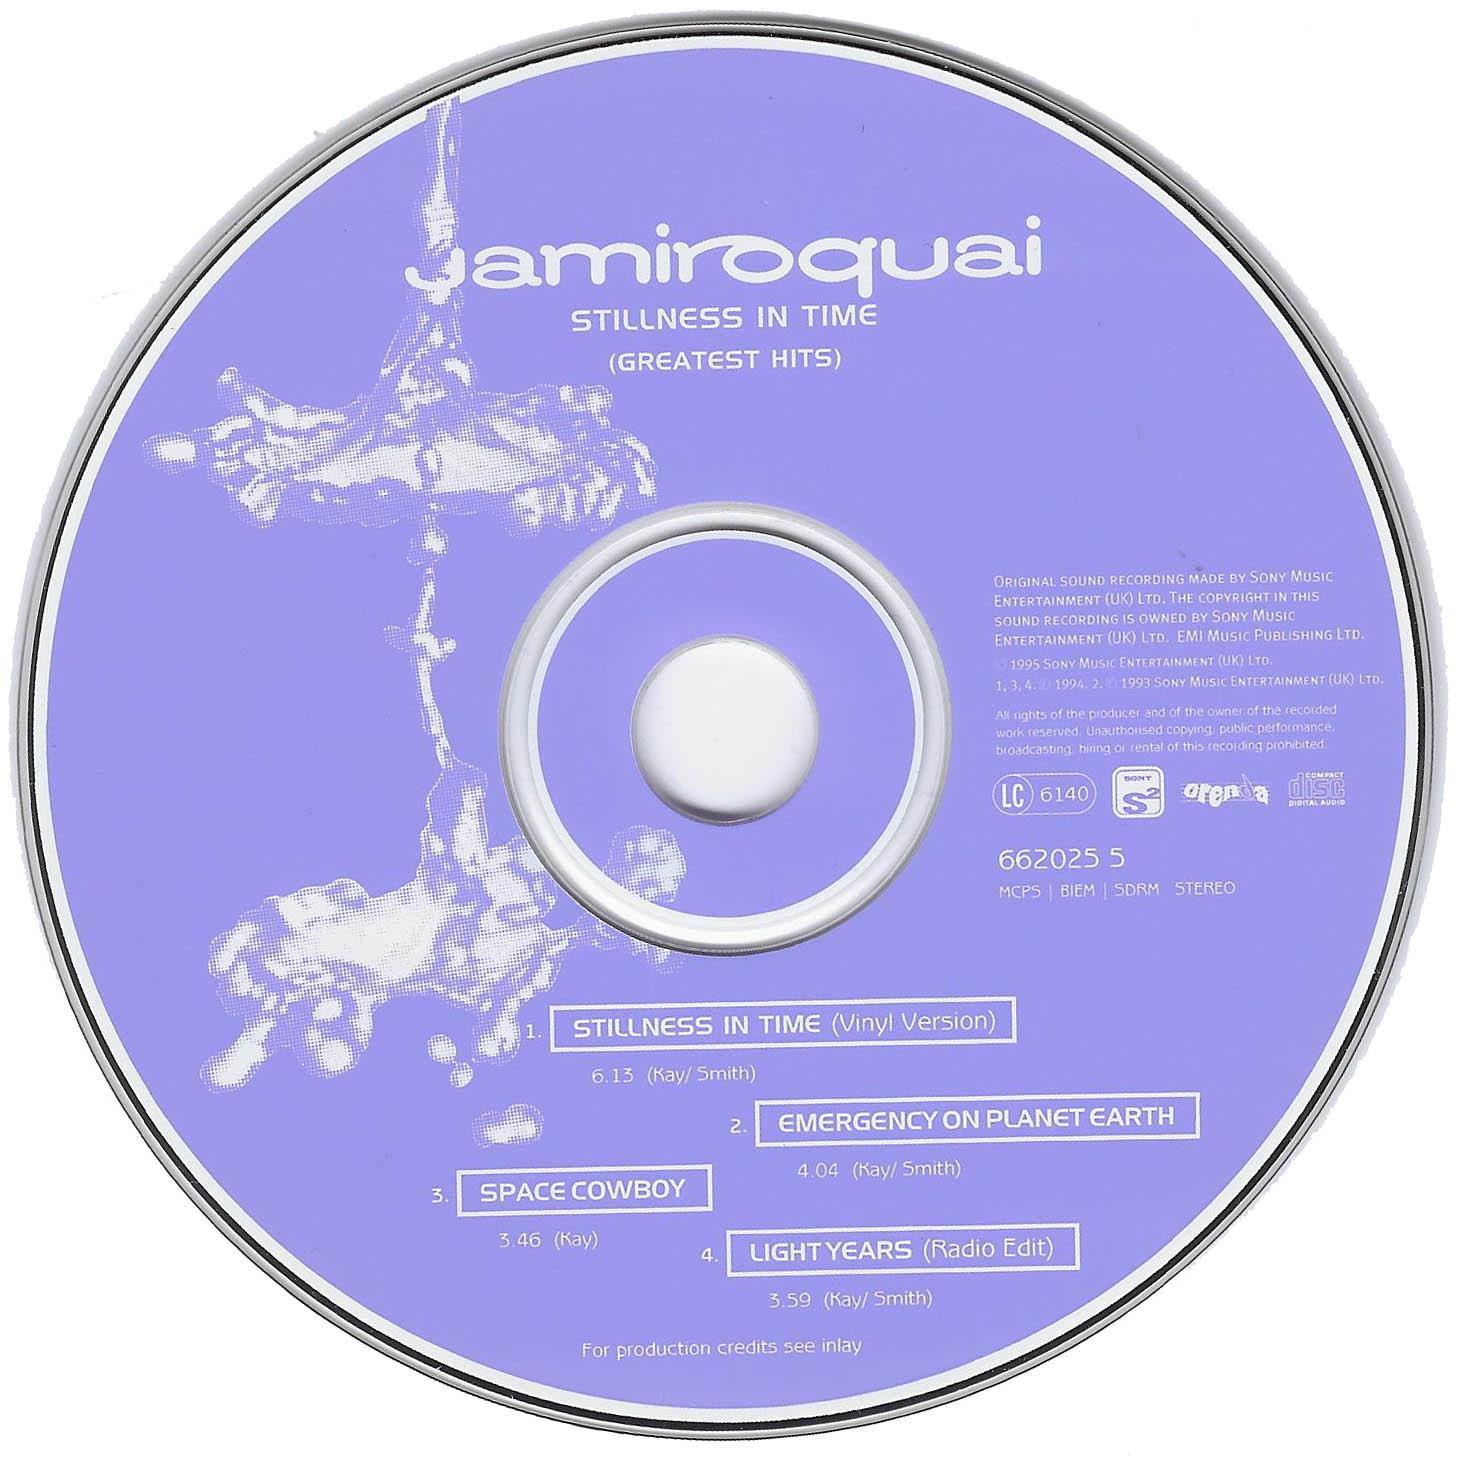 Jamiroquai_Stillness_In_Time_CD2